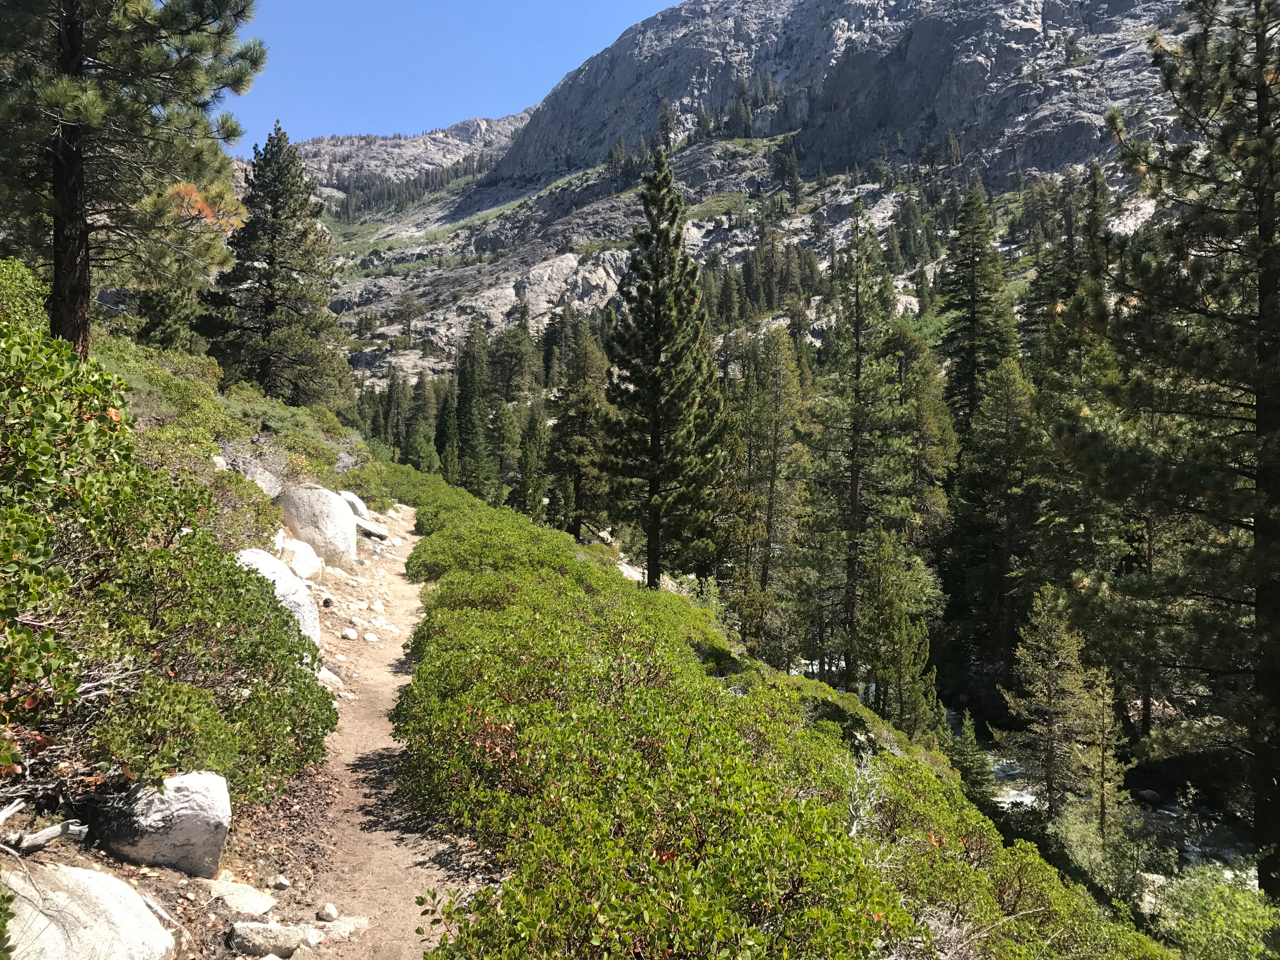 Piute Canyon Trail